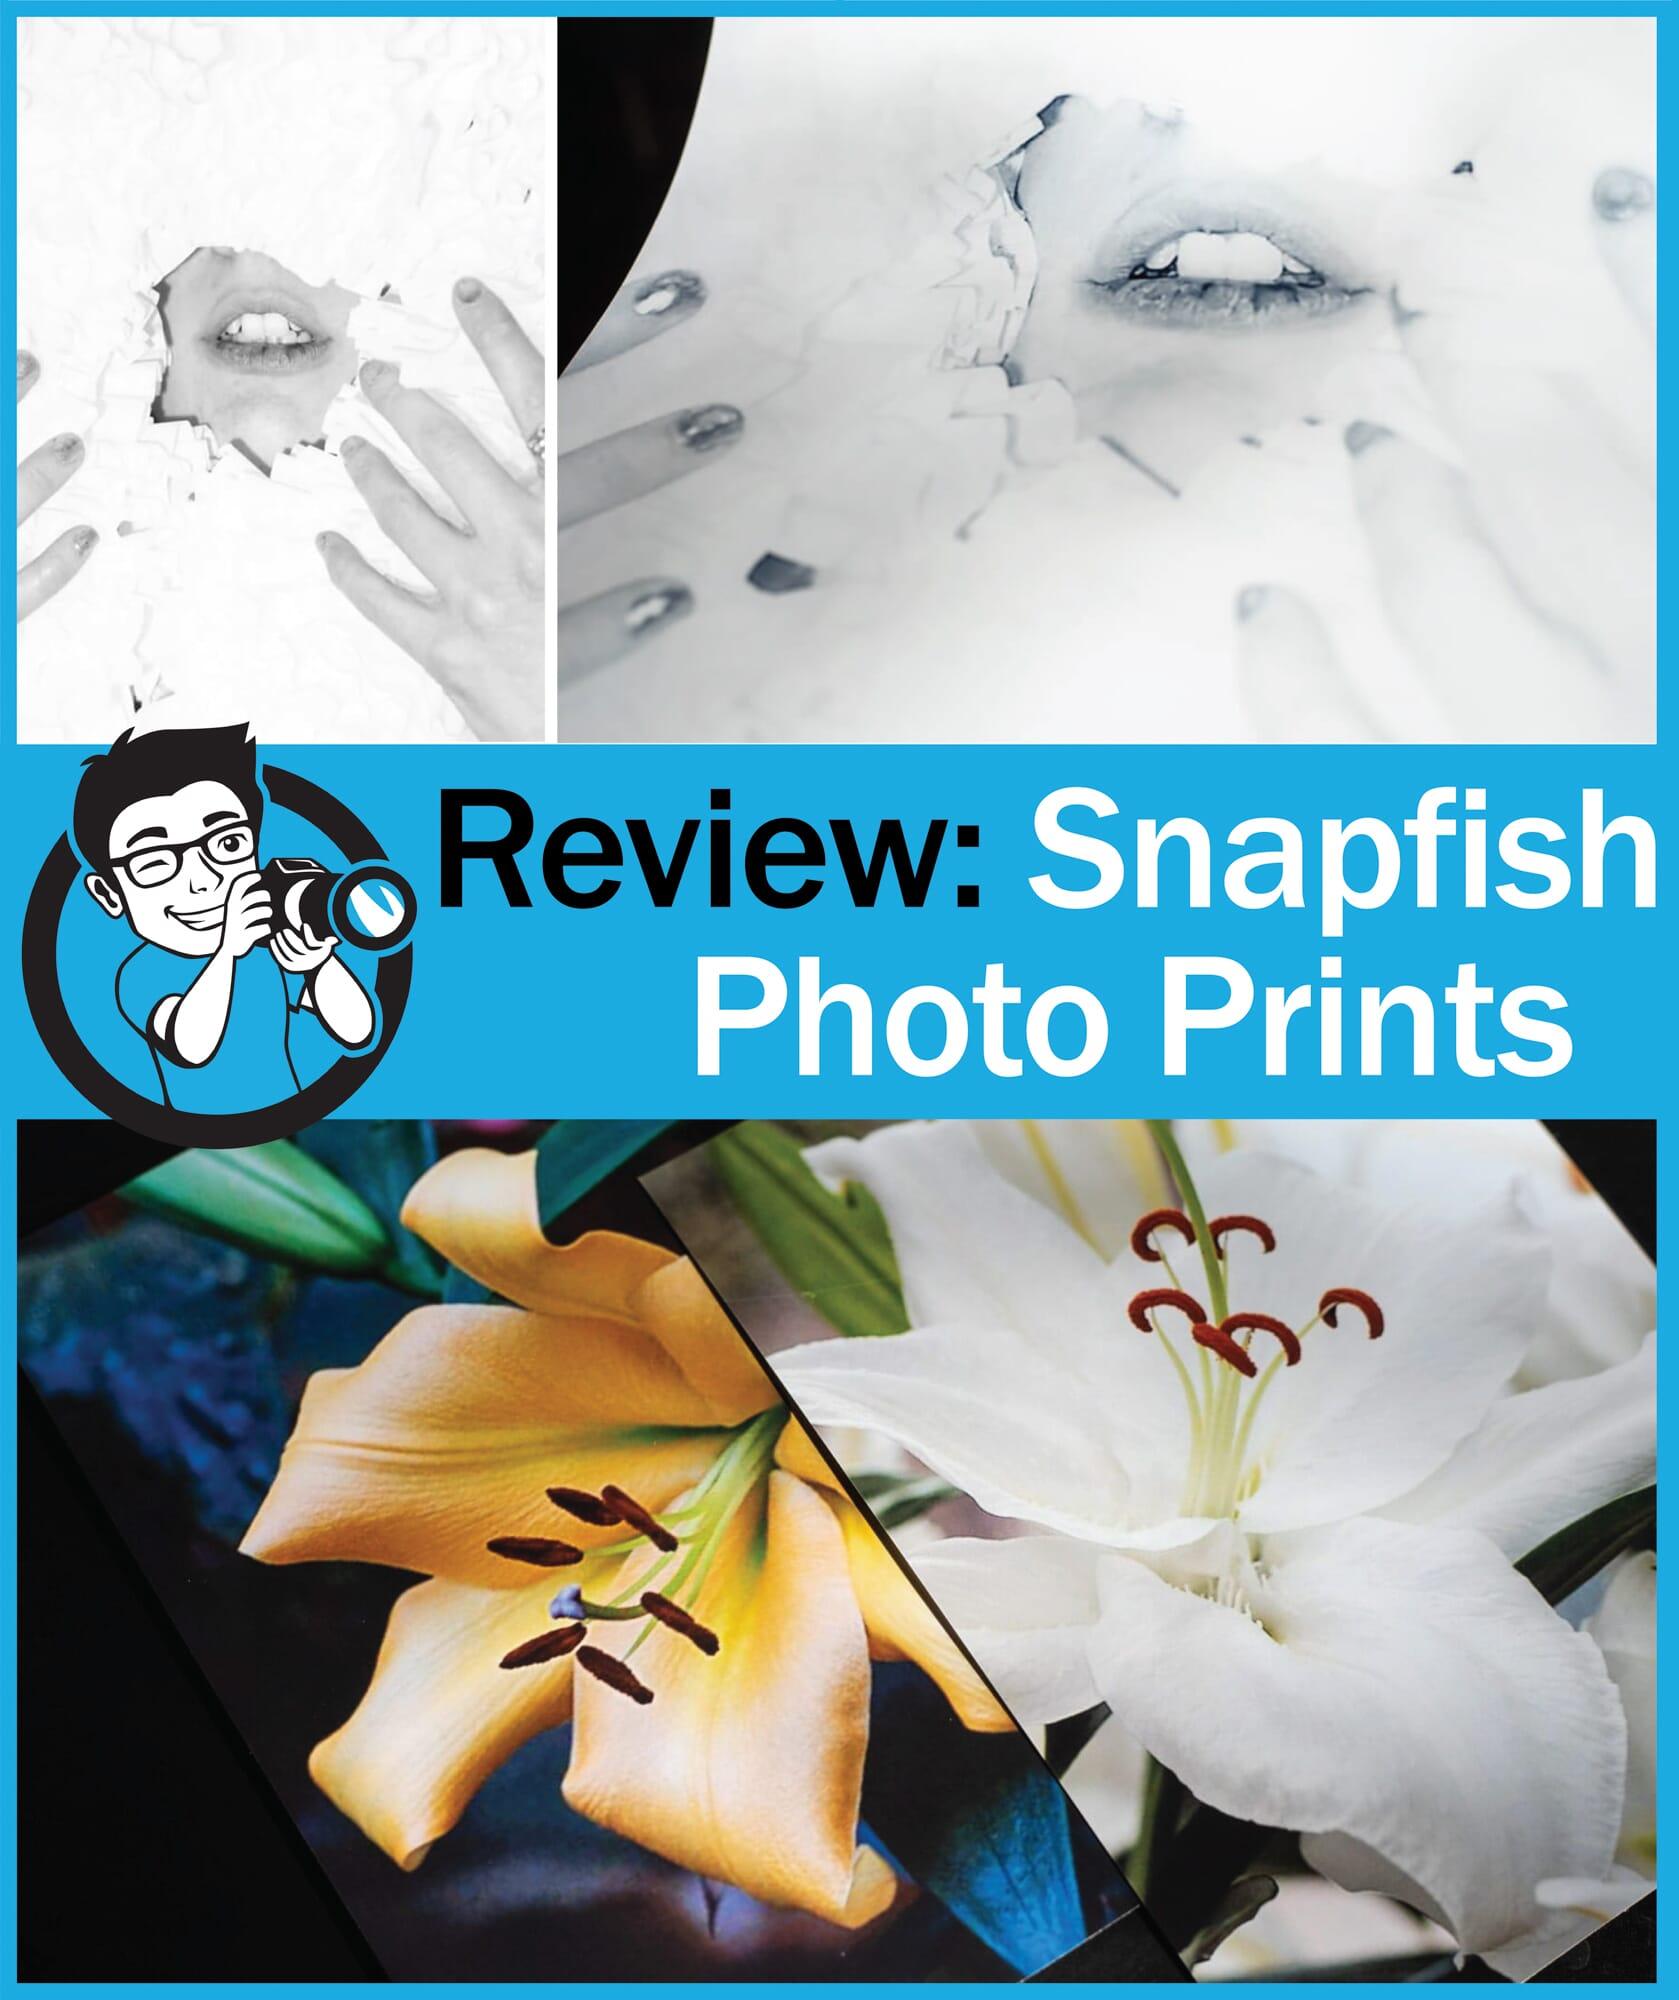 Snapfish Photo Prints Review